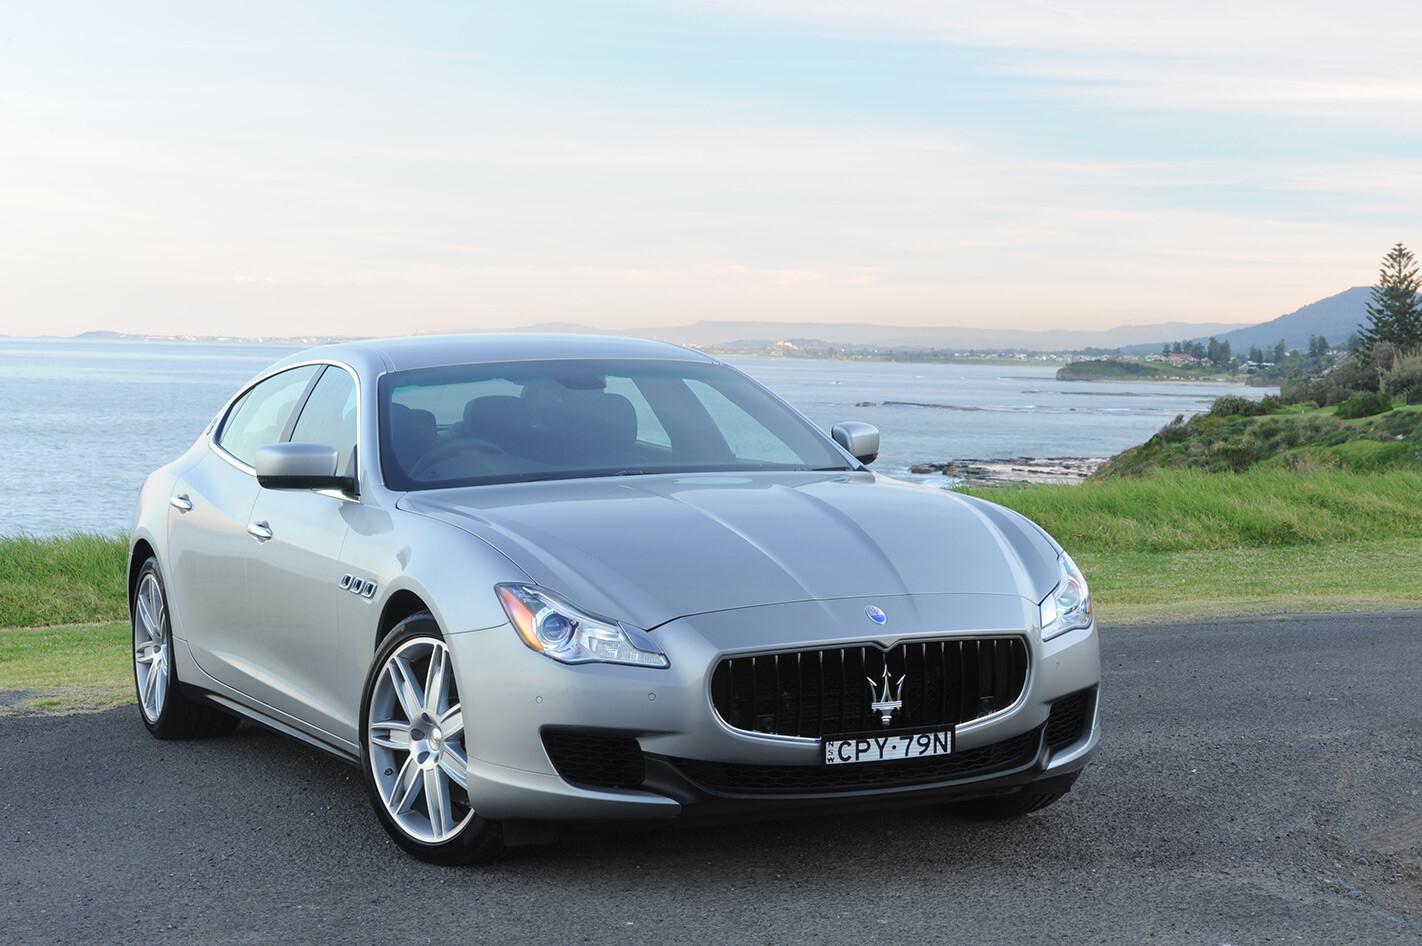 Maserati Quattroporte Turbo Diesel Review